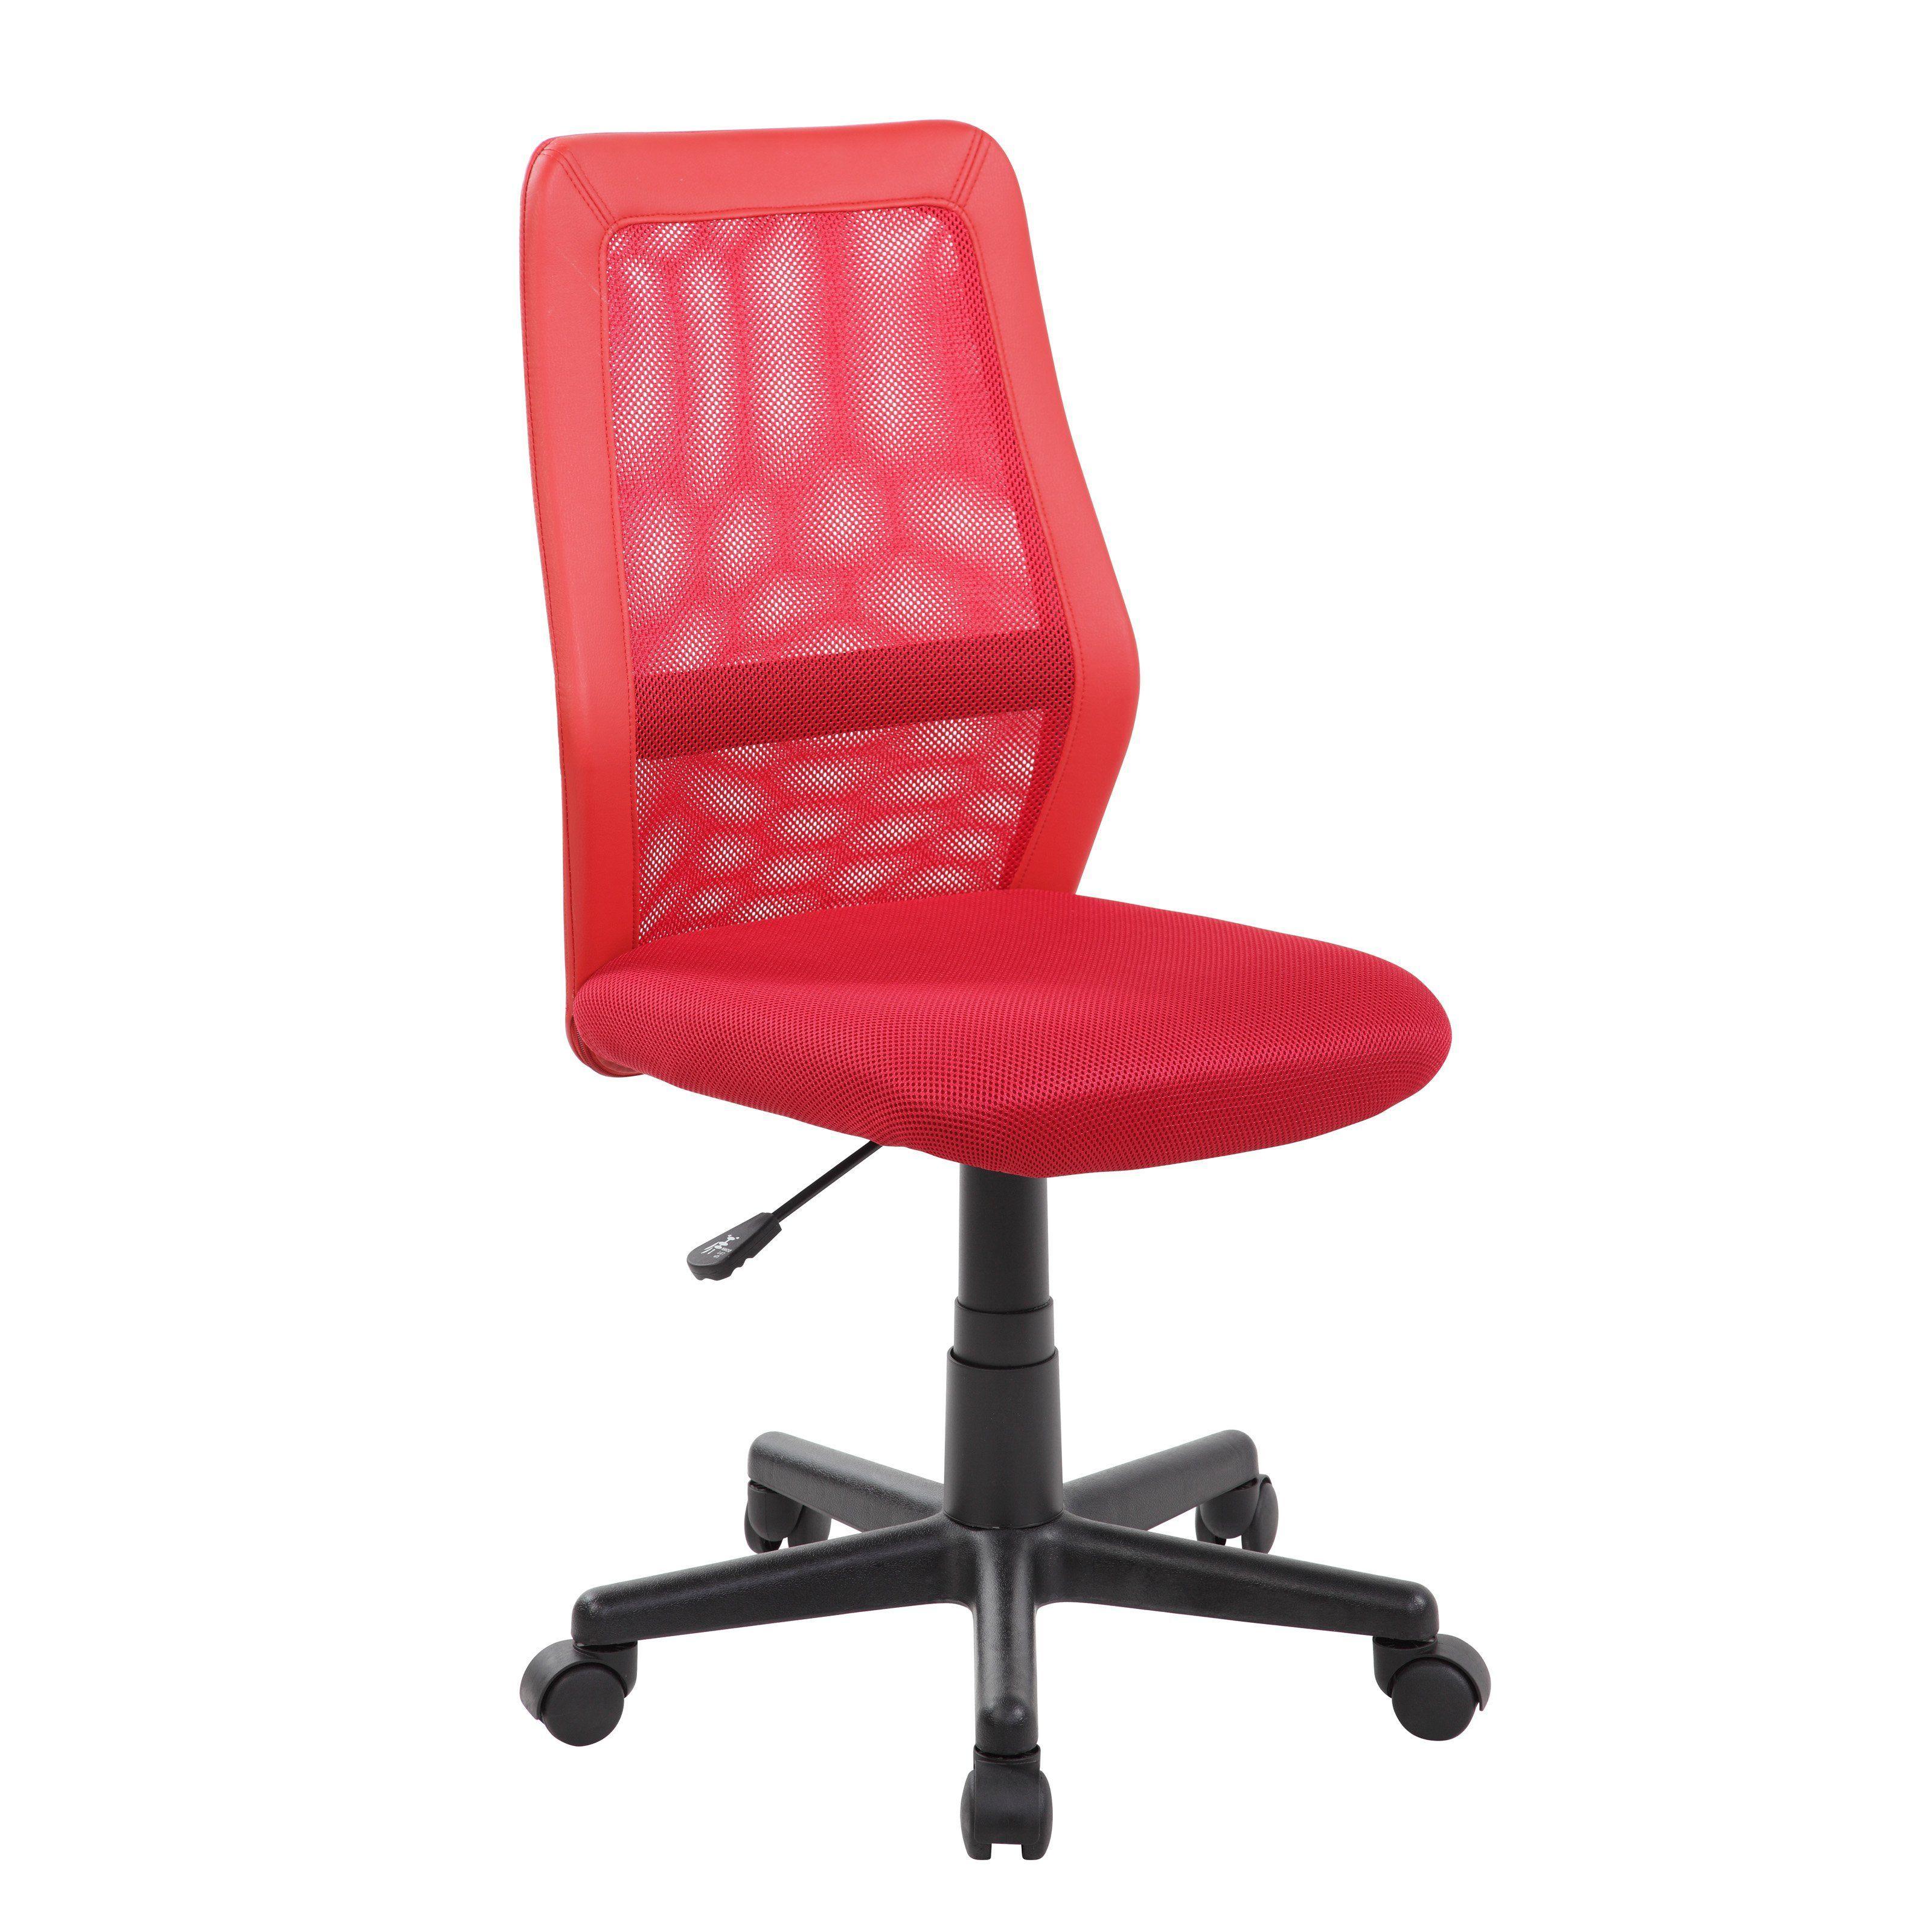 United Chair Industries Ergonomic Mesh Task fice Chair HN 8009